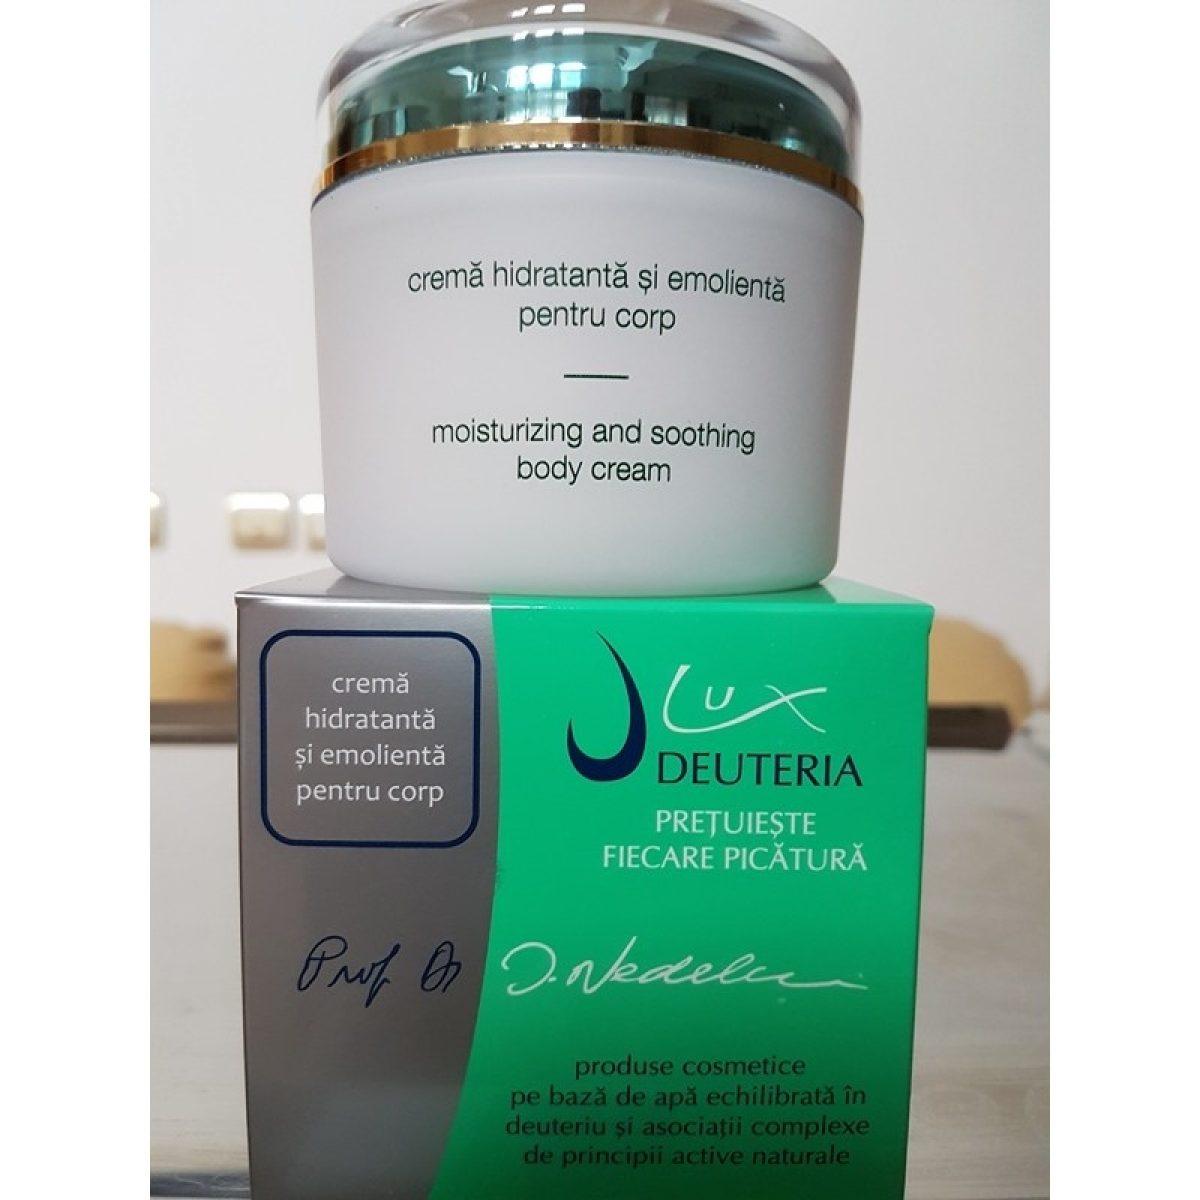 Crema hidratanta si emolienta pentru corp